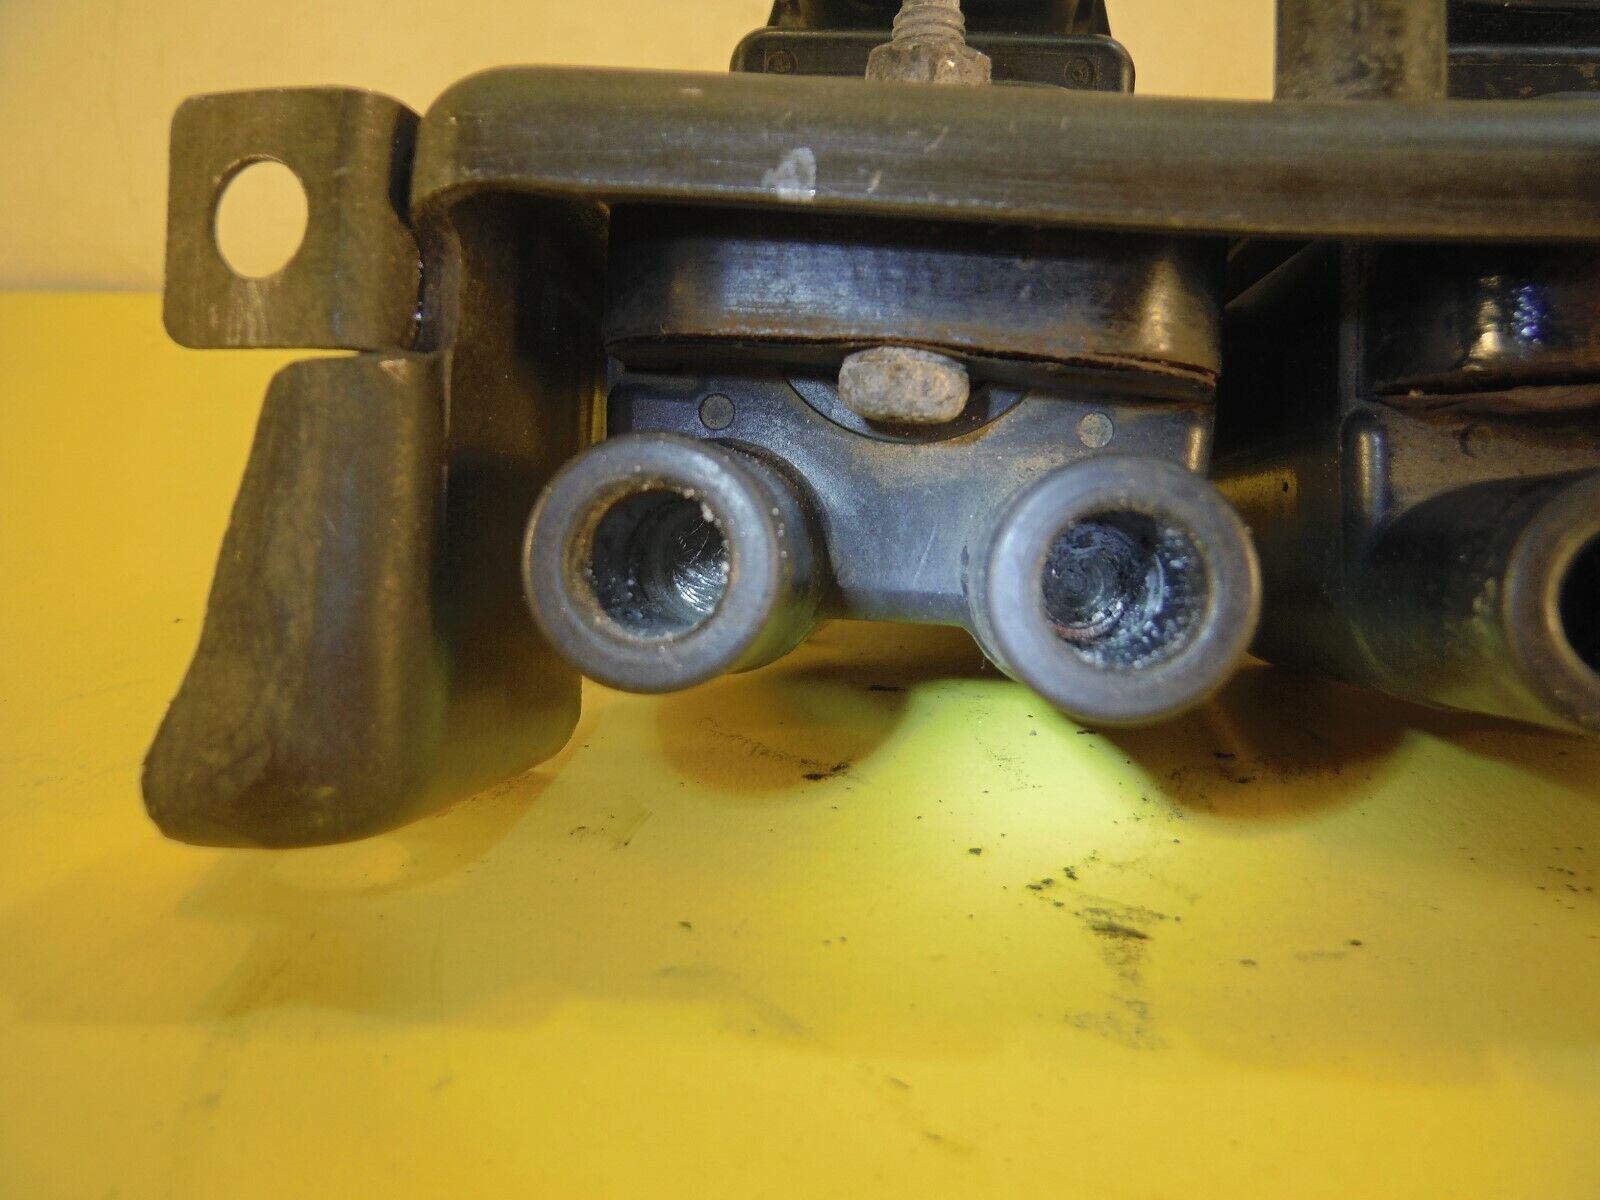 Miatamecca New OEM Ignition Coil Assy Fits 94-95 Mazda Miata MX5 BPE81810XA9U